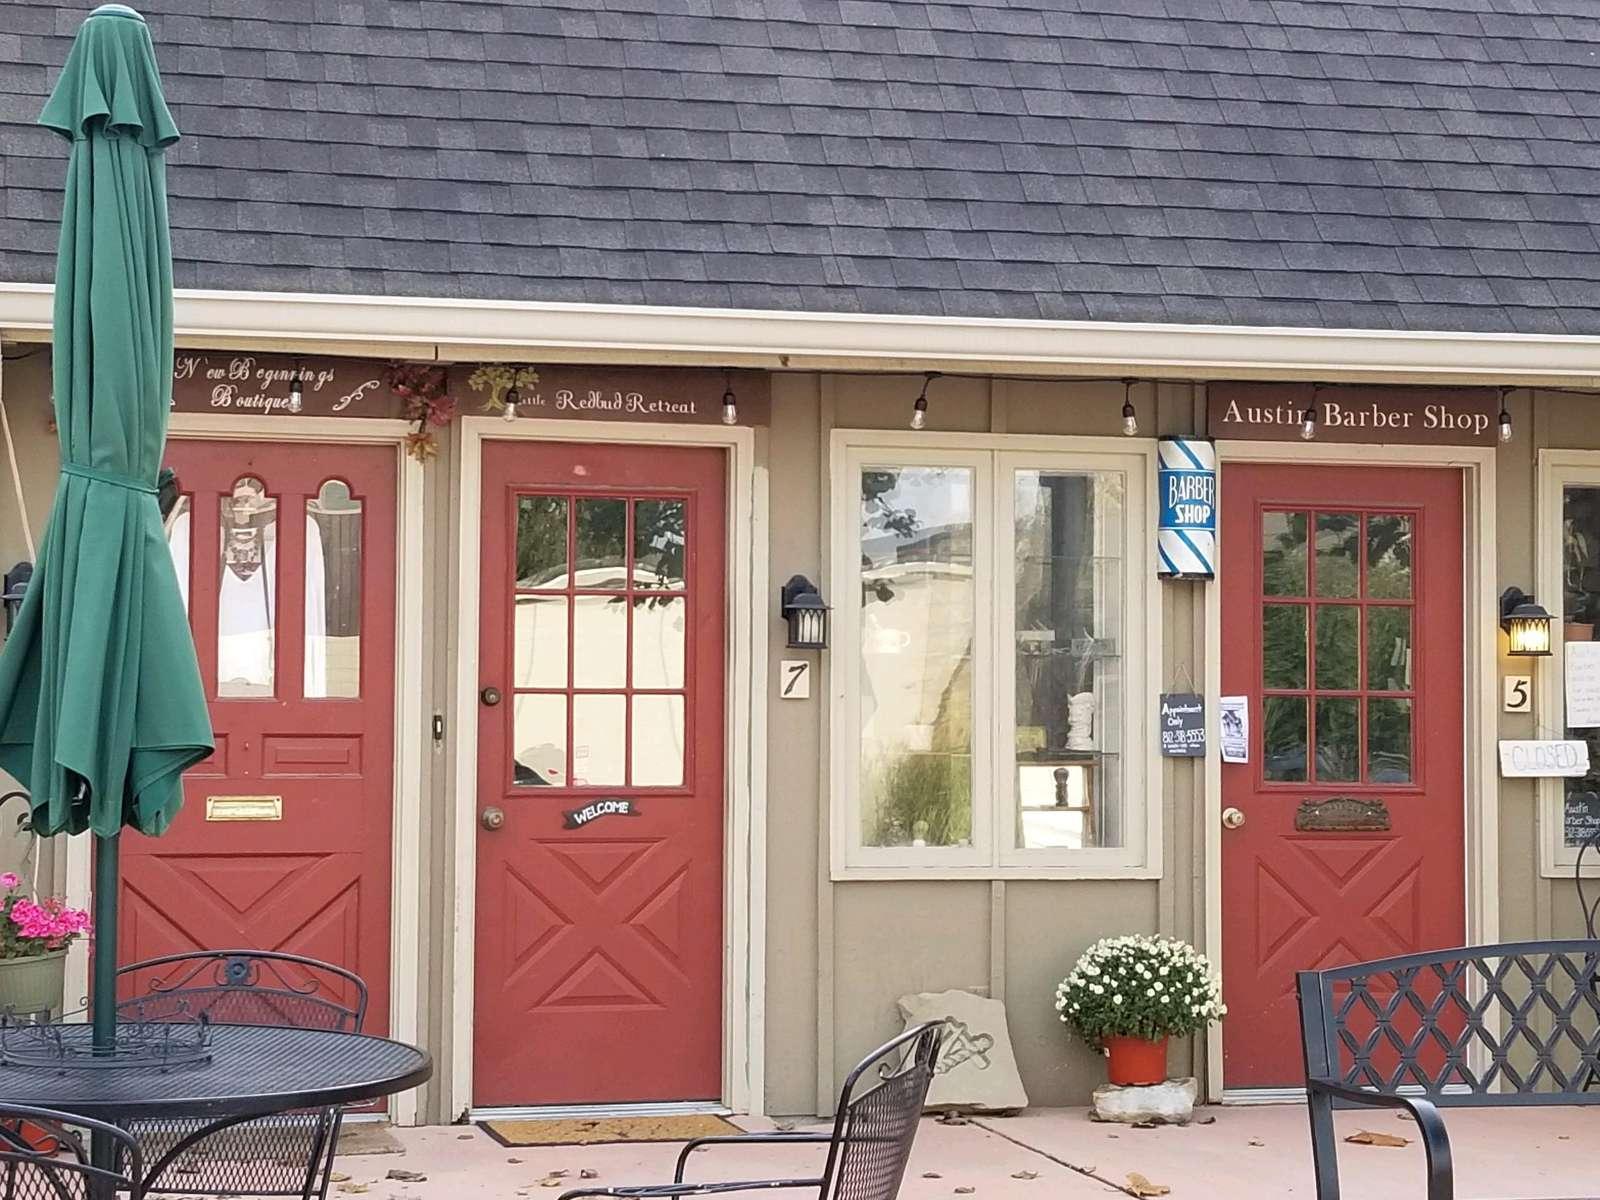 Redbud Retreat Suite - property